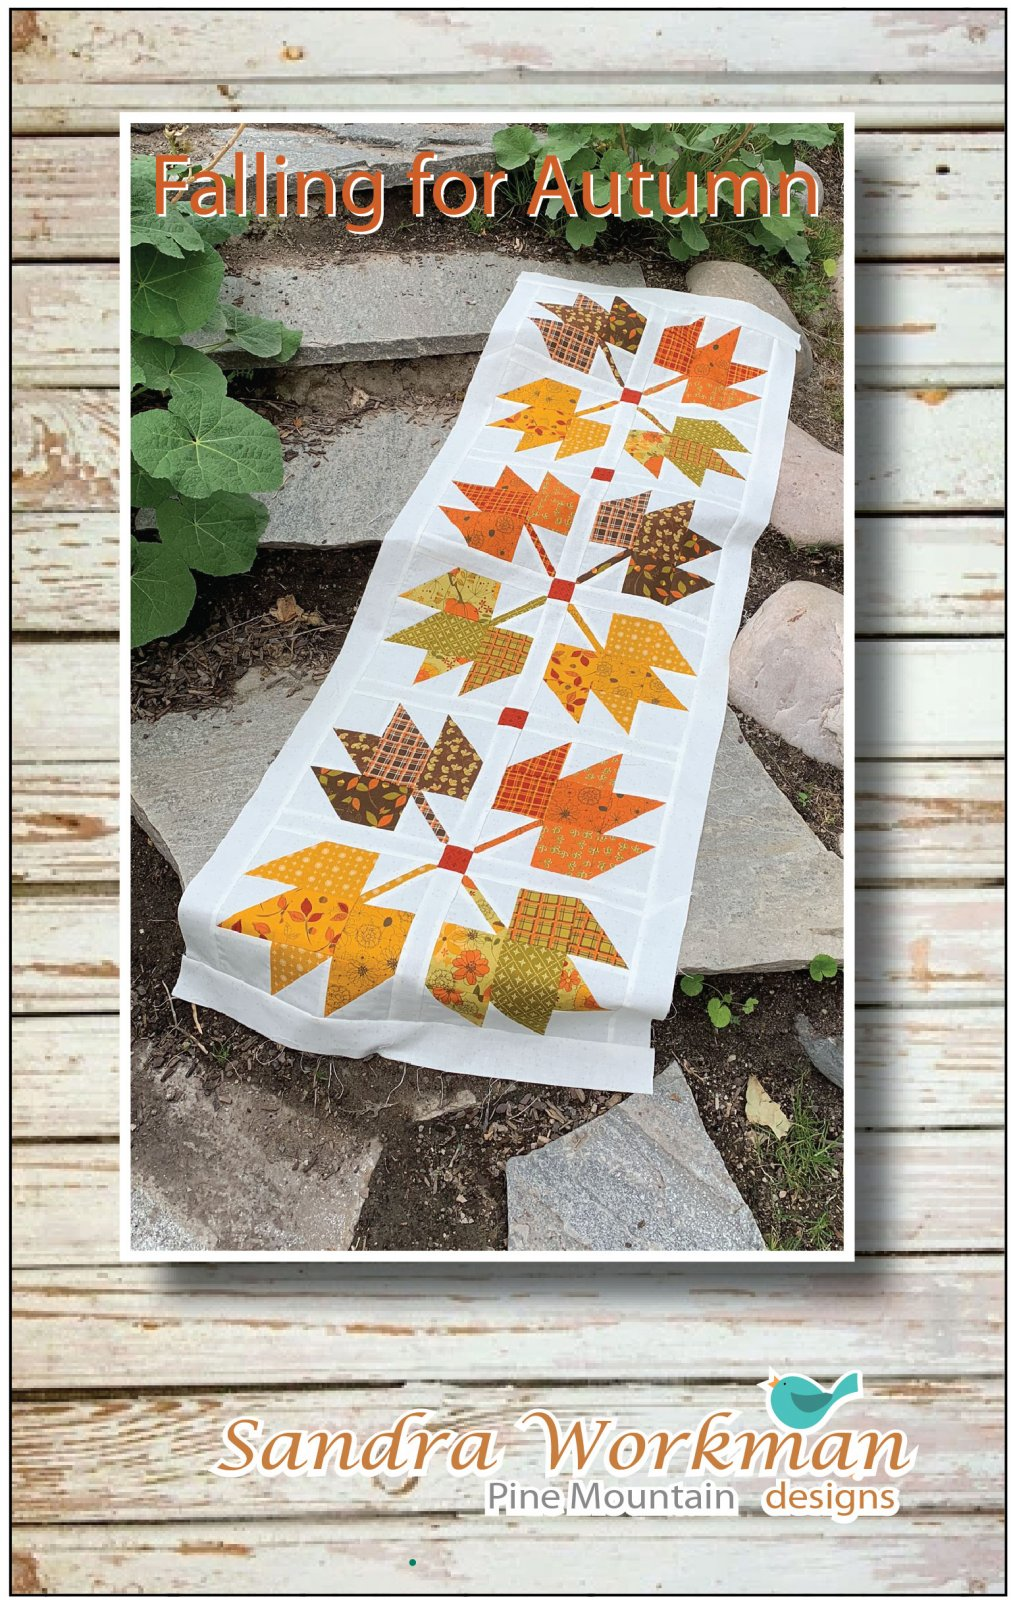 Falling for Autumn table runner pattern